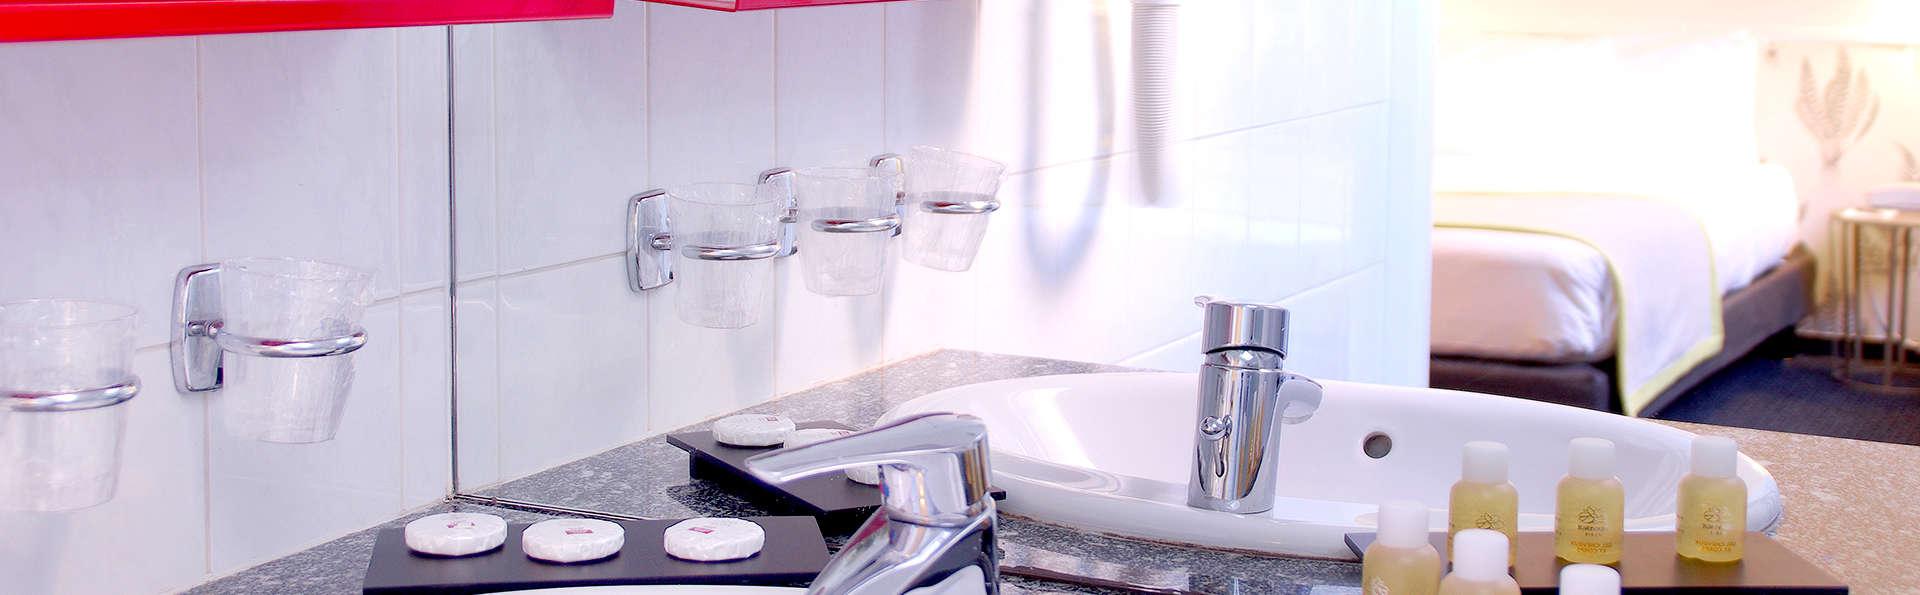 Hotel George - Astotel - Edit_Bathroom5.jpg